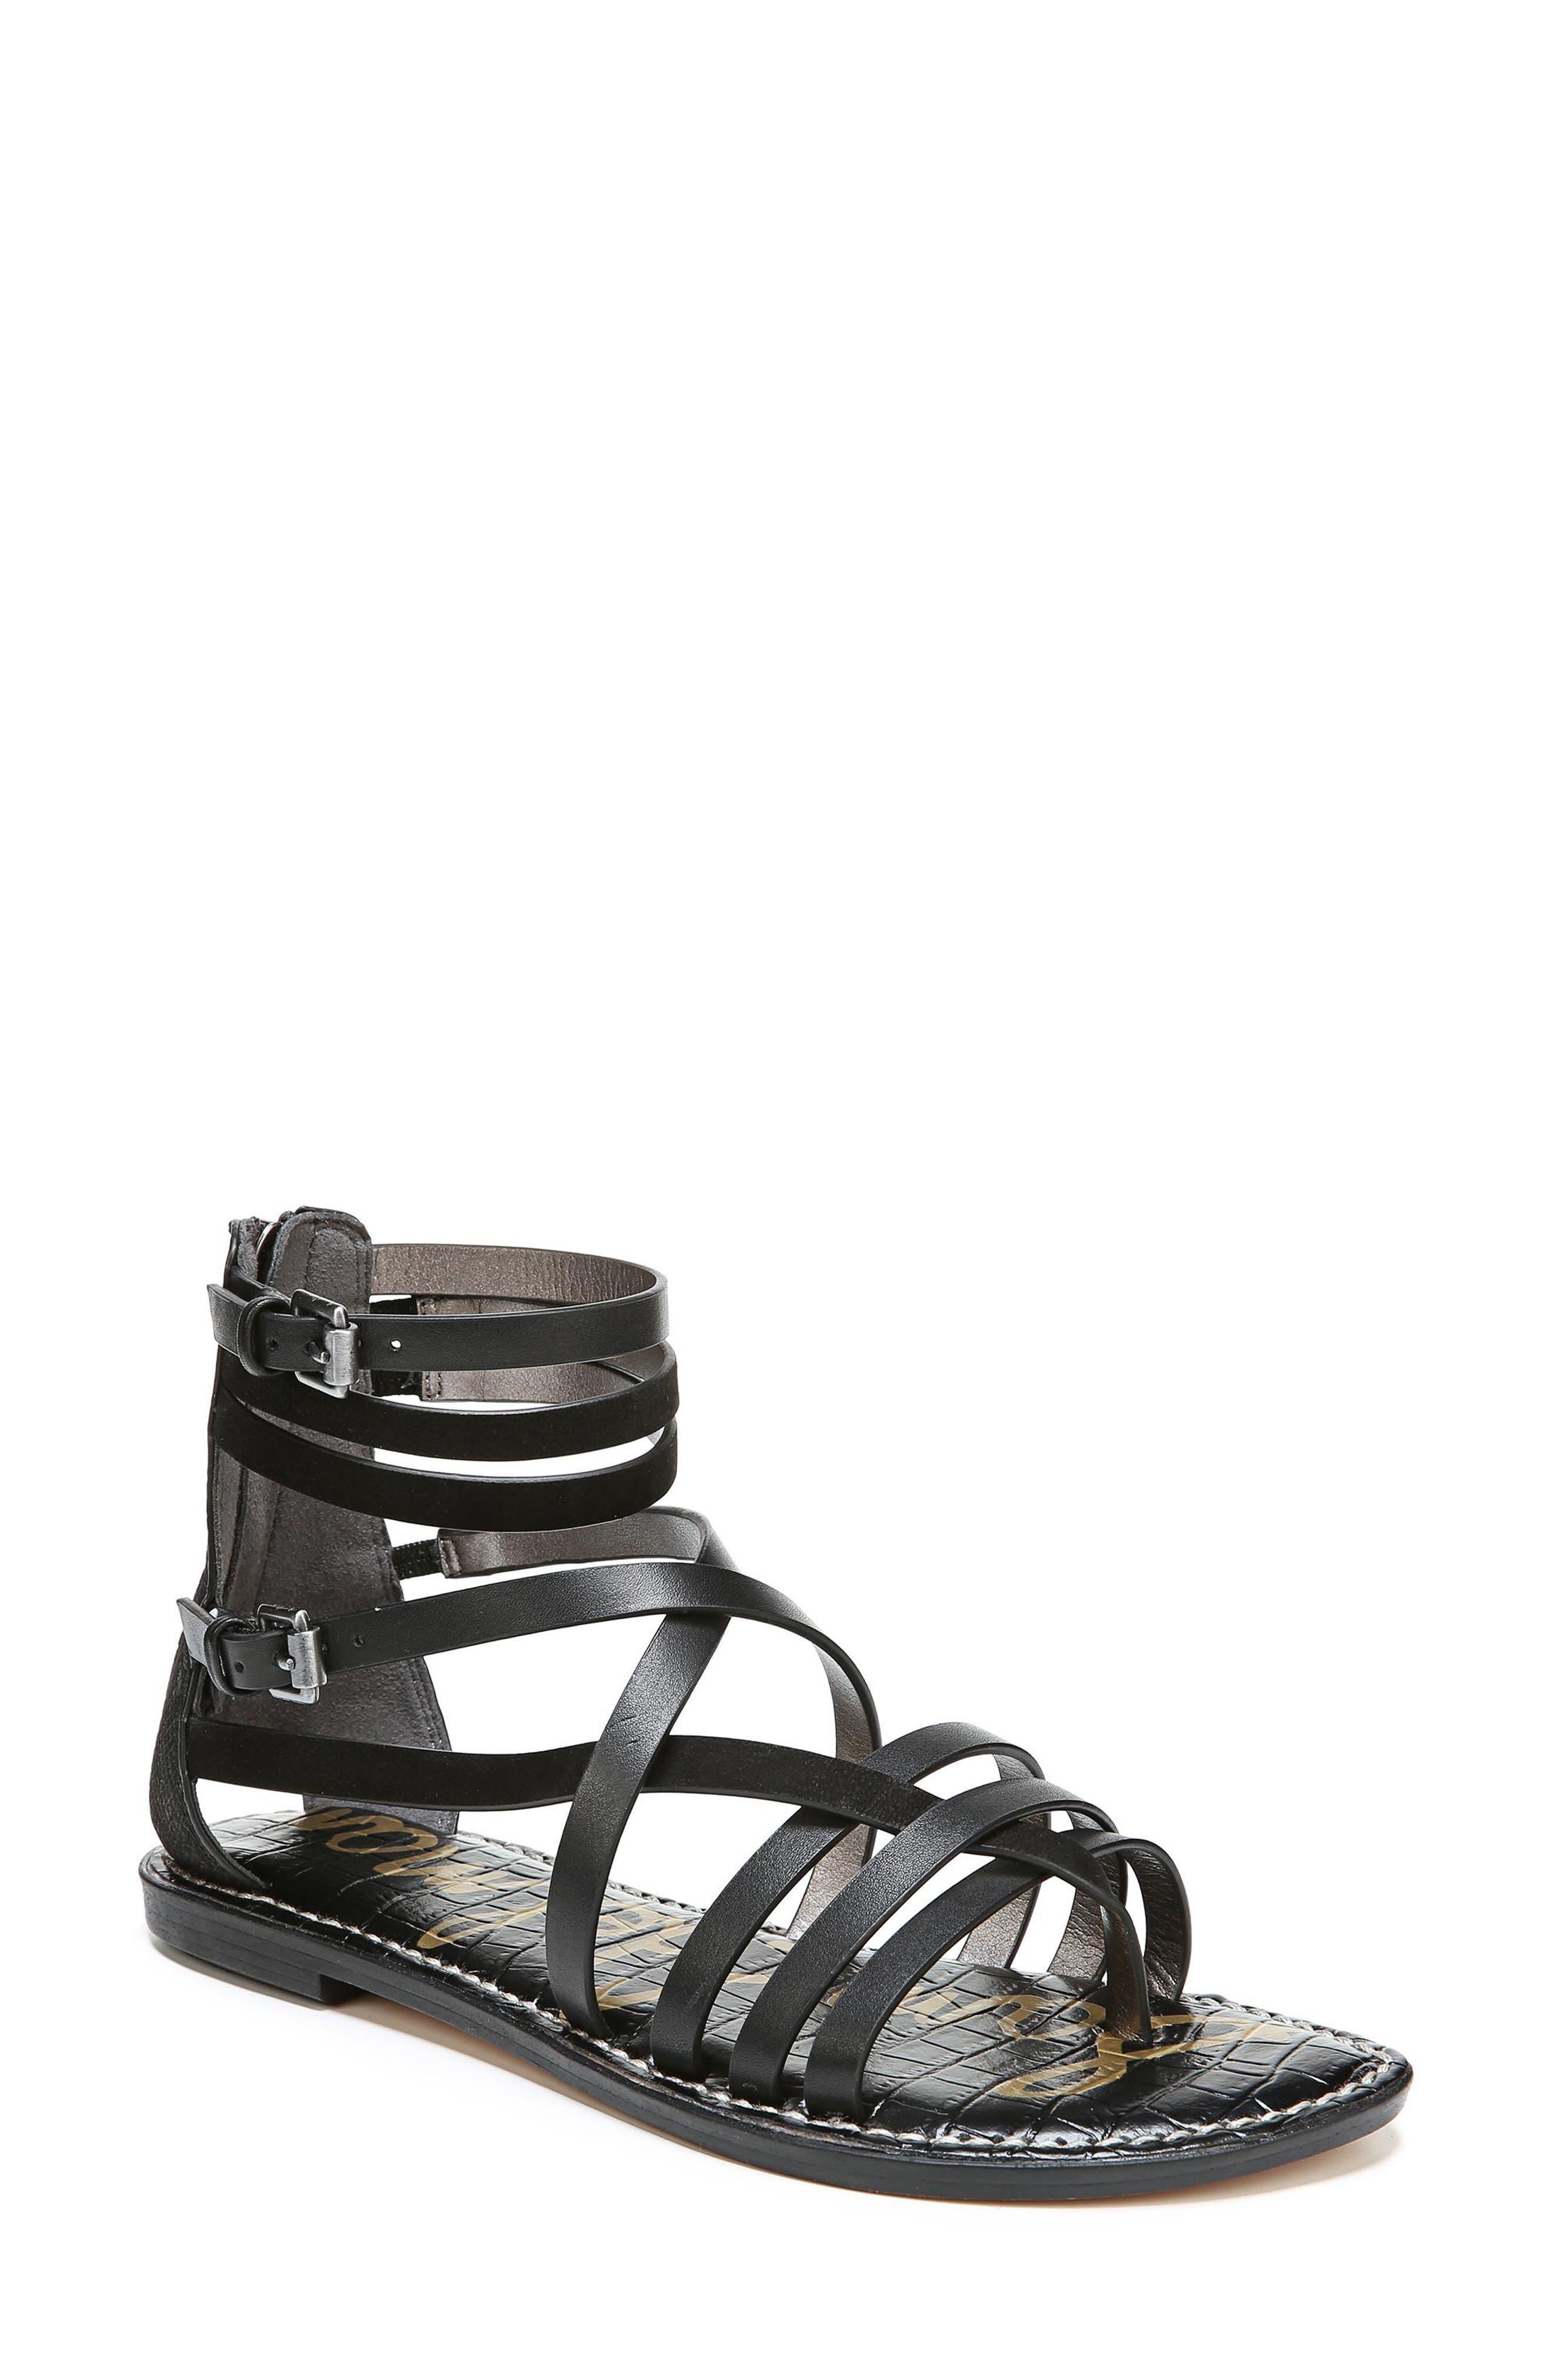 Sam Edelman Women's Ganesa Strappy Sandal dwFYUcD6r